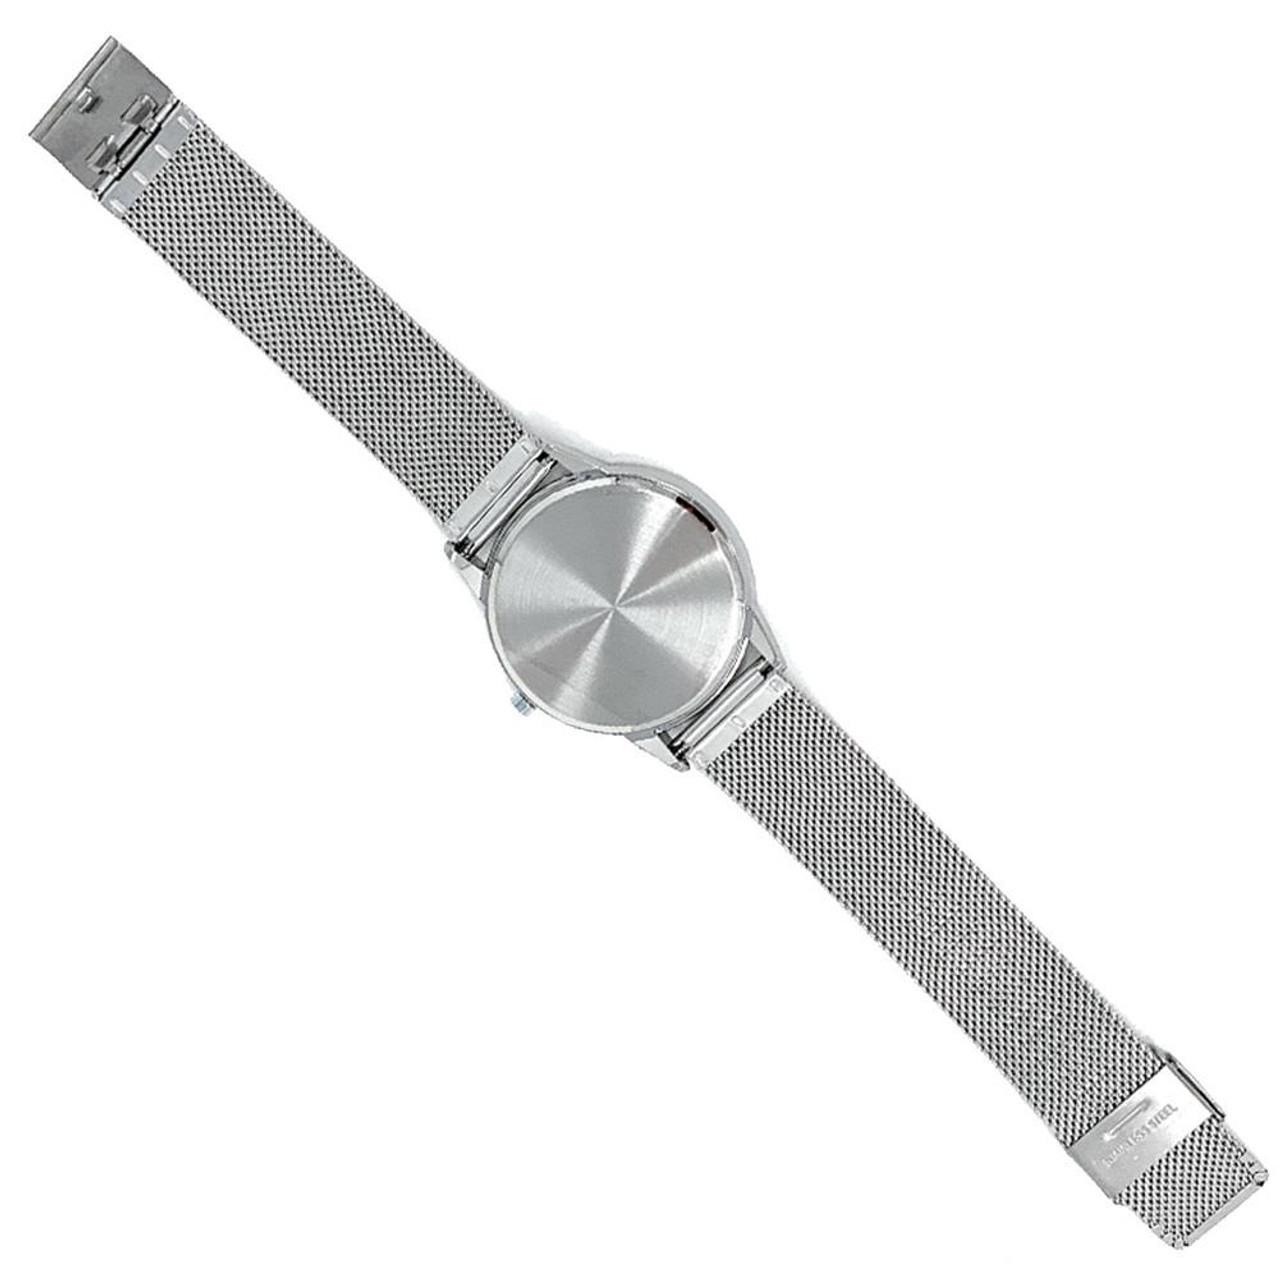 University of Oregon Ducks Watch Silver Mesh Statement Wristwatch